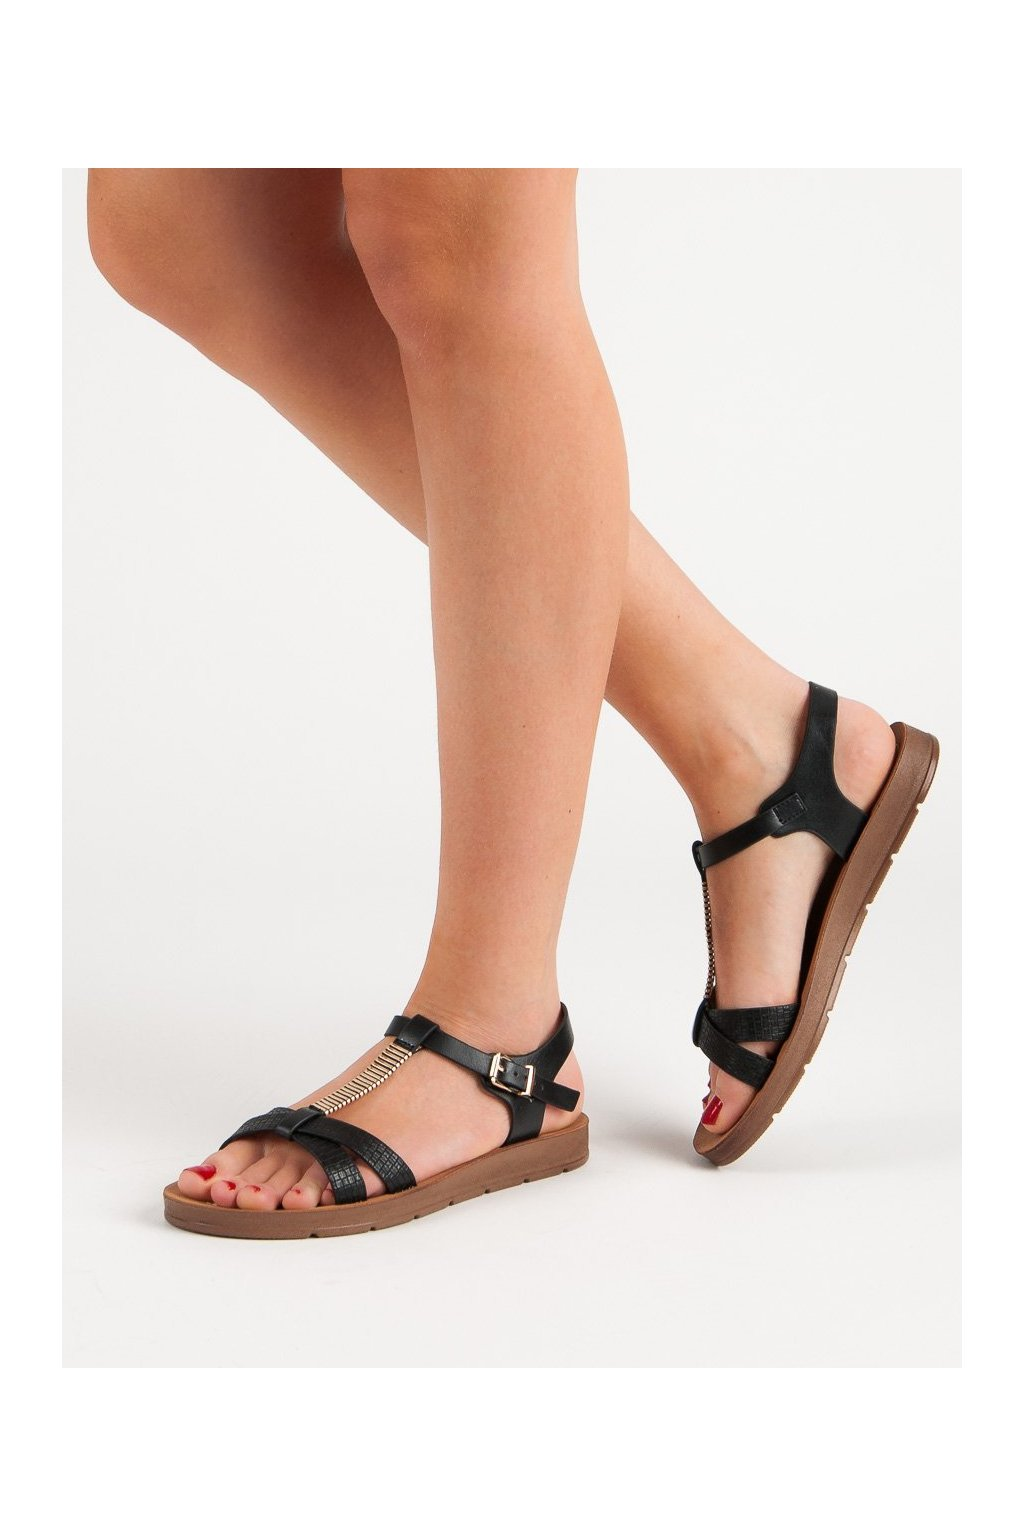 Čierne sandále Filippo kod DS802/19B